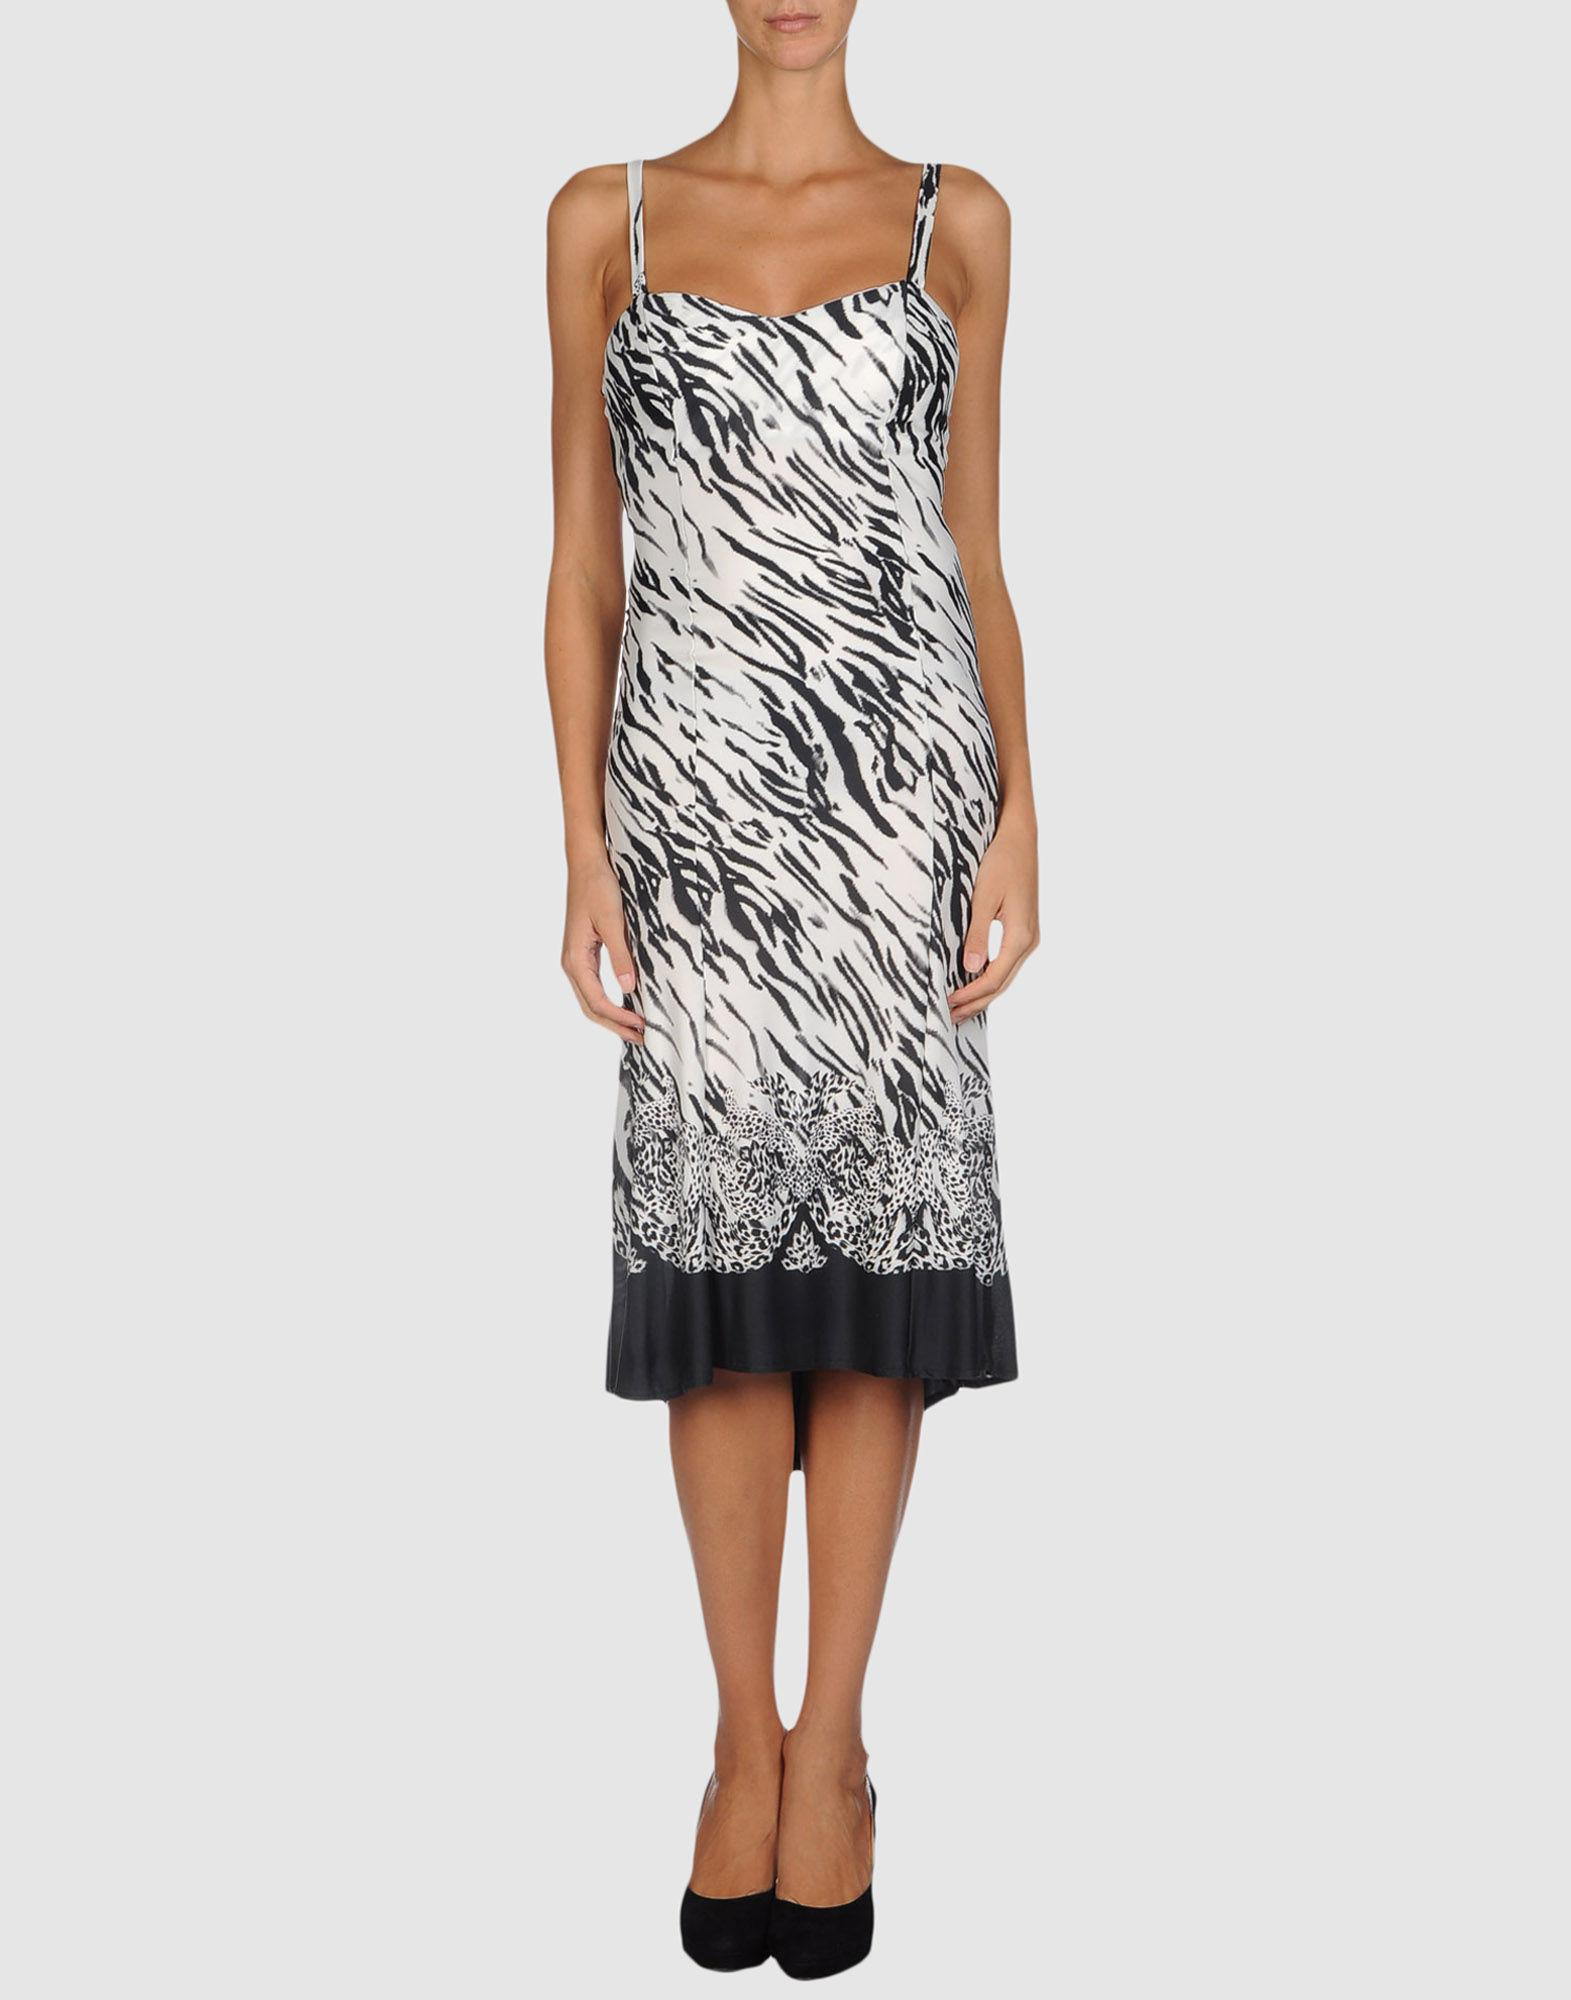 34215630SO 14 f - Casual Φορεματα Versace 2011 2012 Κωδ.05